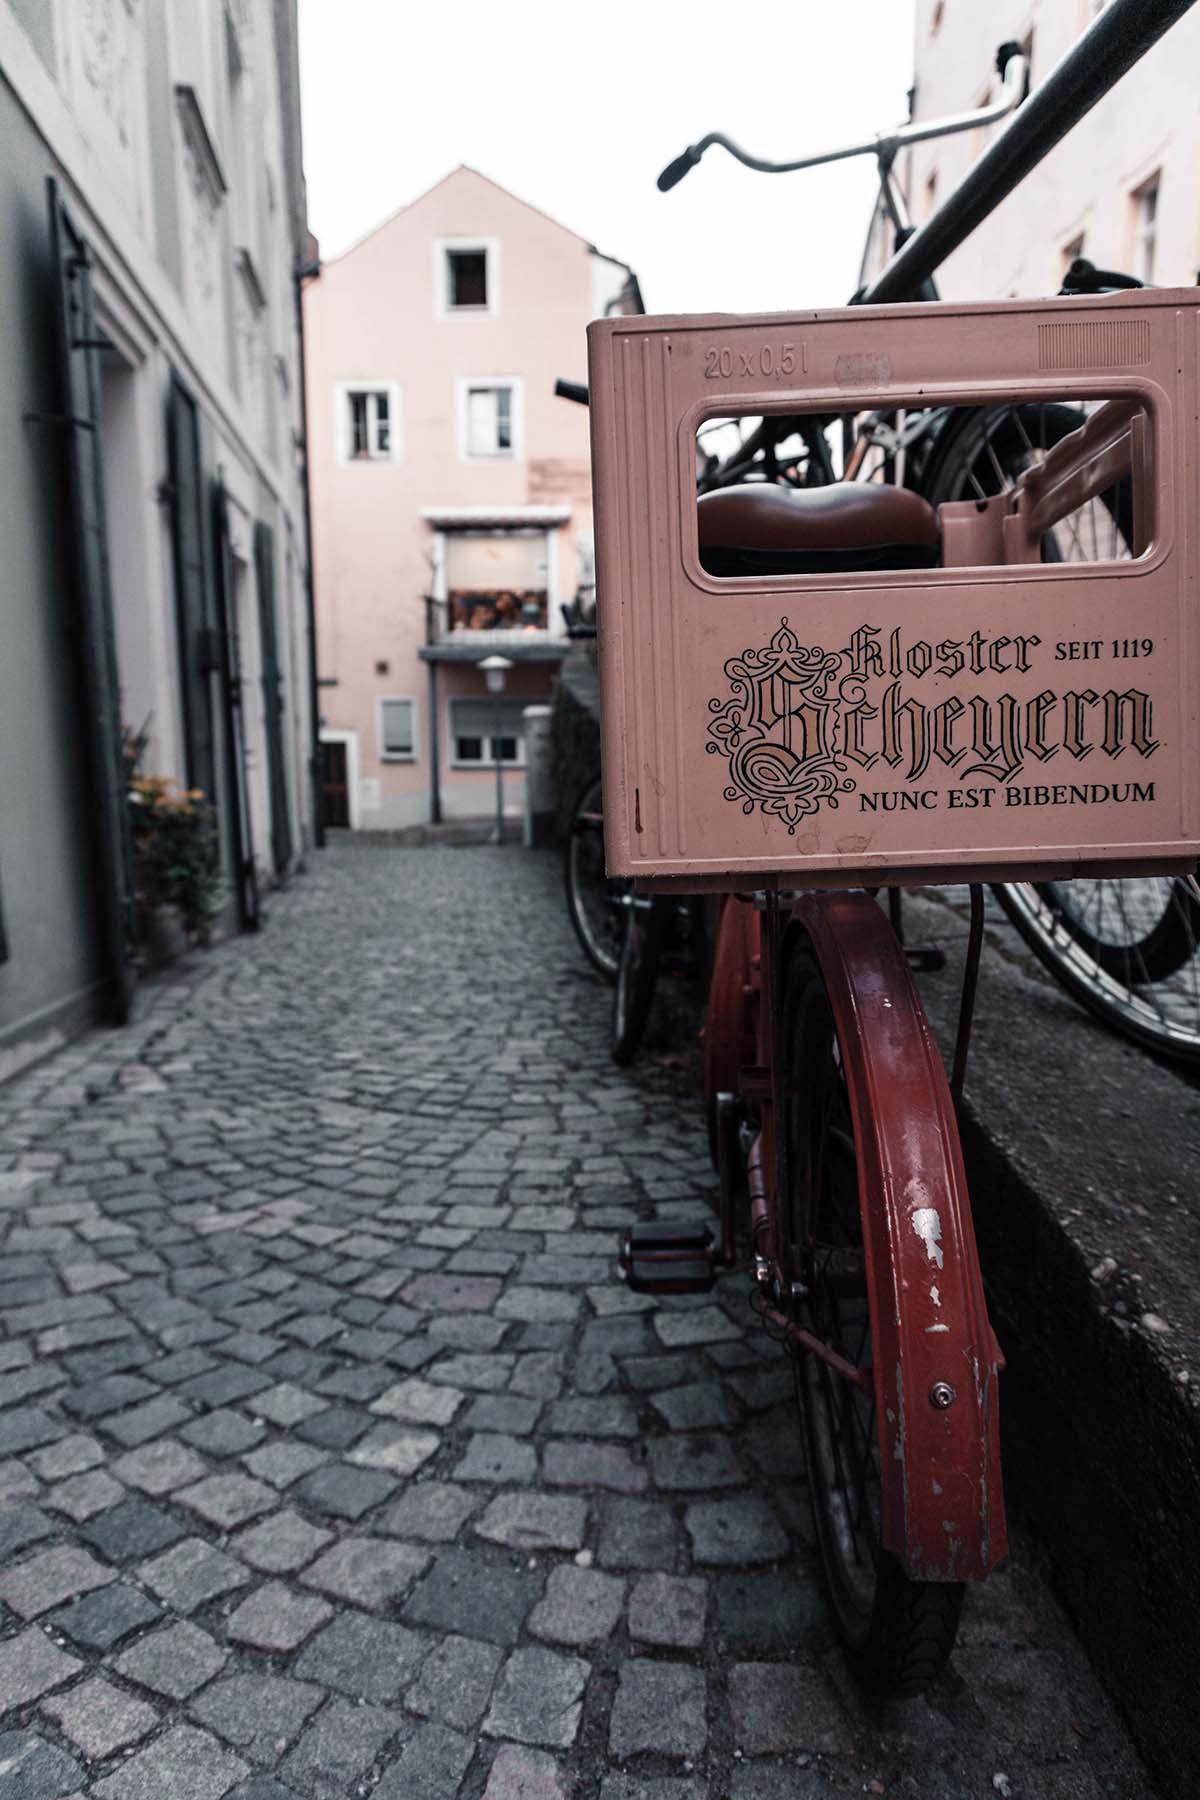 passau-fahrrad-bierkassen-gasse-01